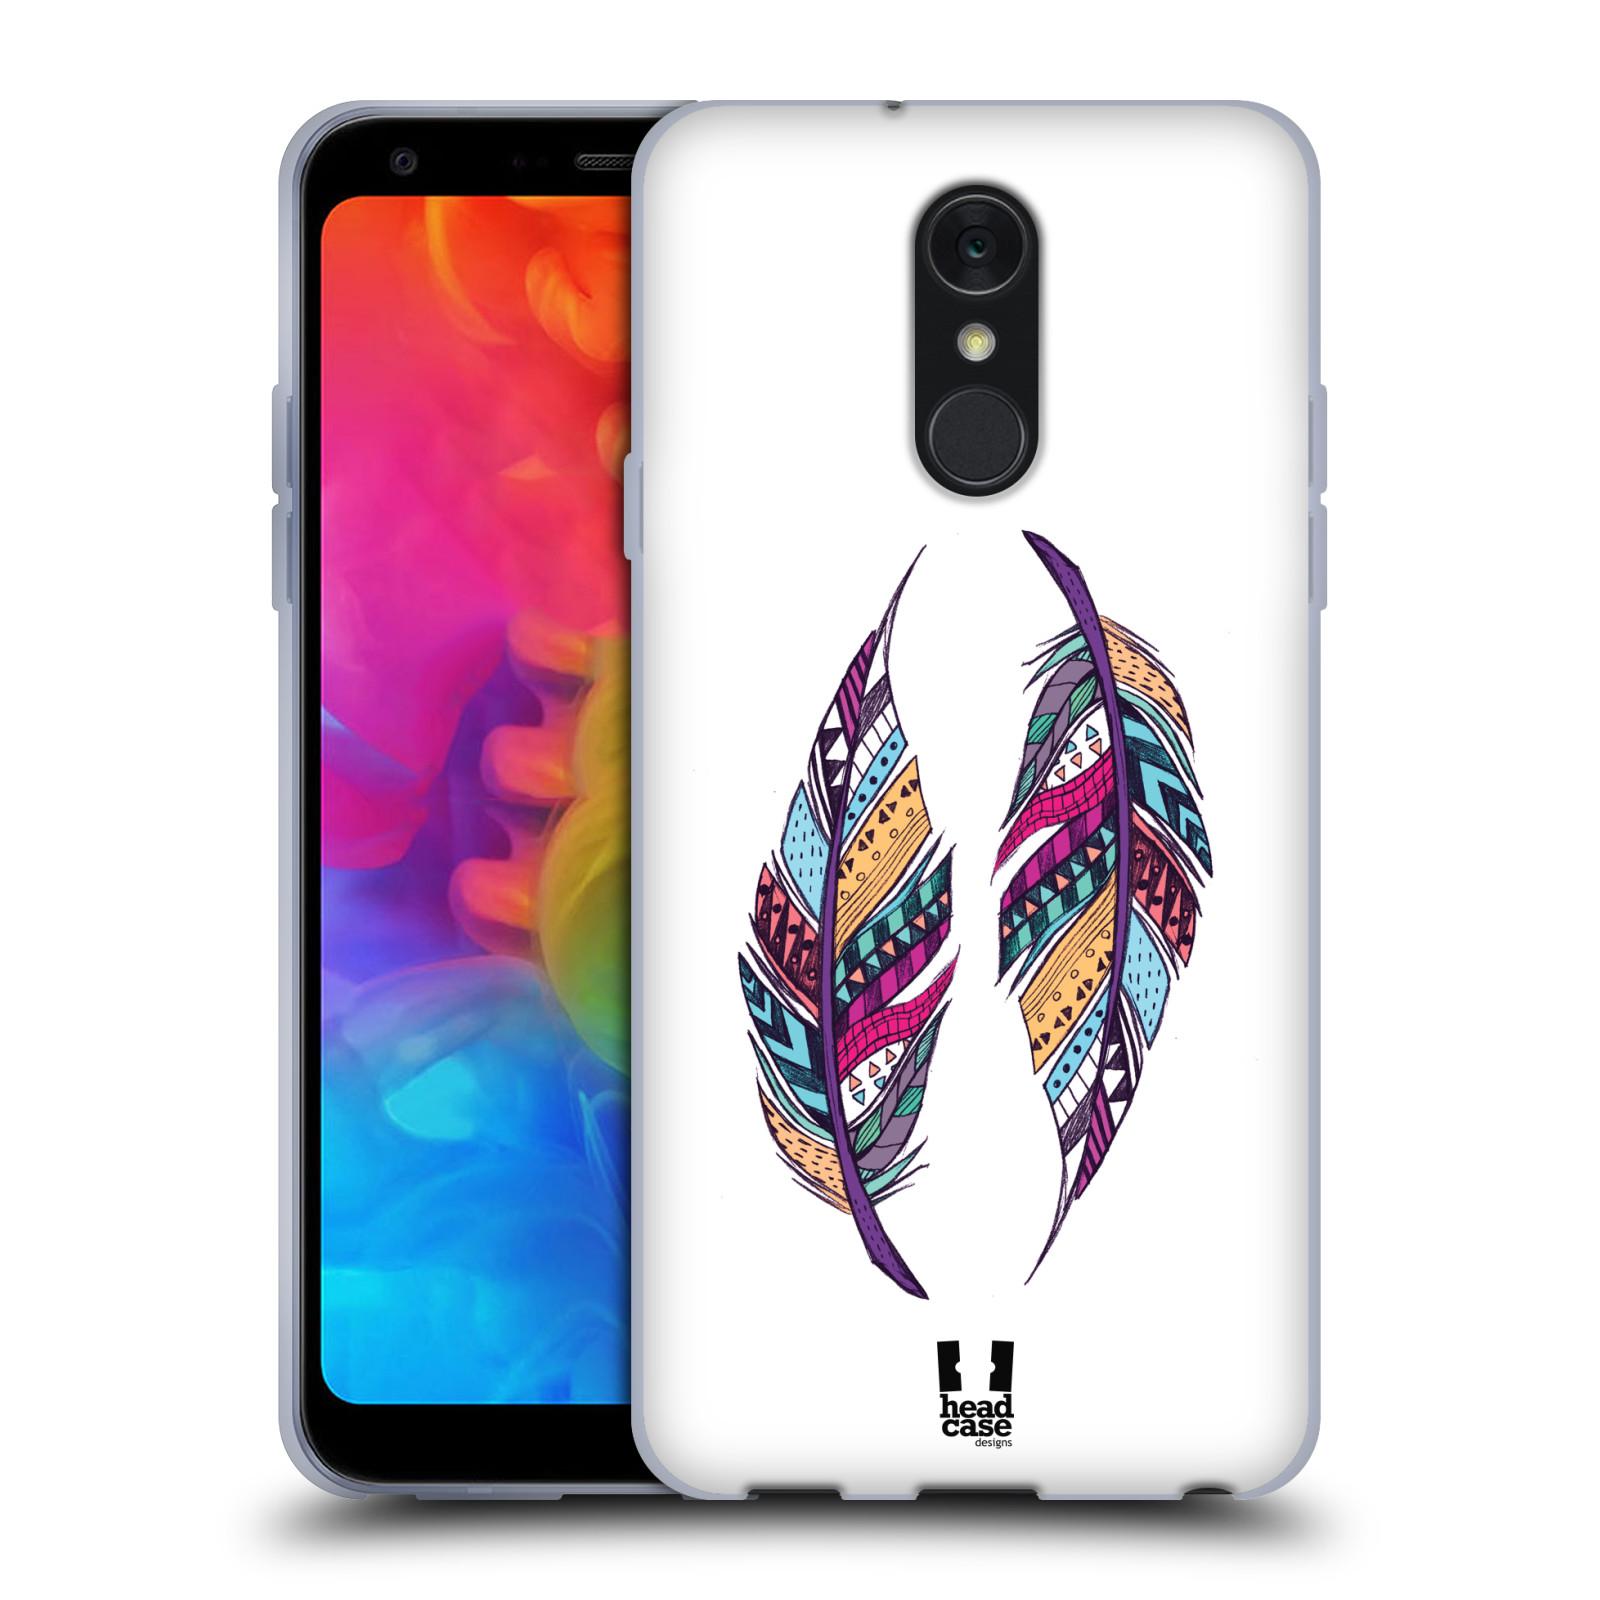 Silikonové pouzdro na mobil LG Q7 - Head Case - AZTEC PÍRKA